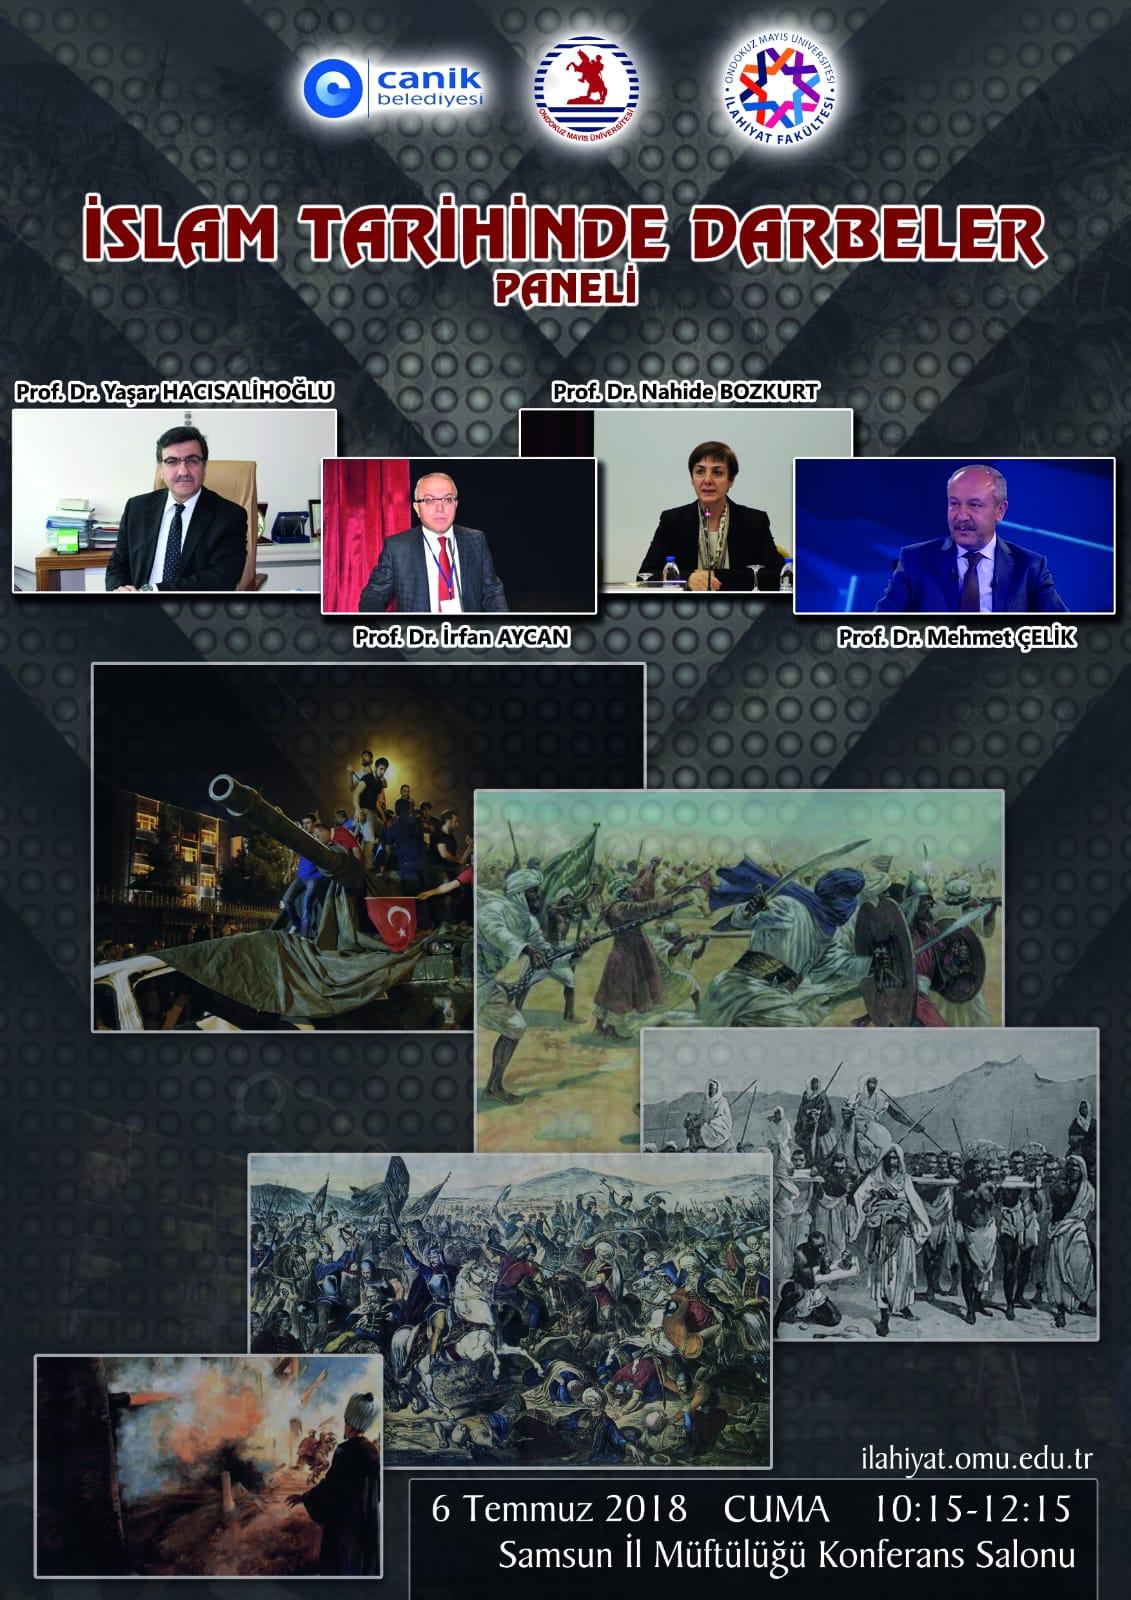 http://www.omu.edu.tr/sites/default/files/omu_islam_tarihinde_darbeler_2.jpg